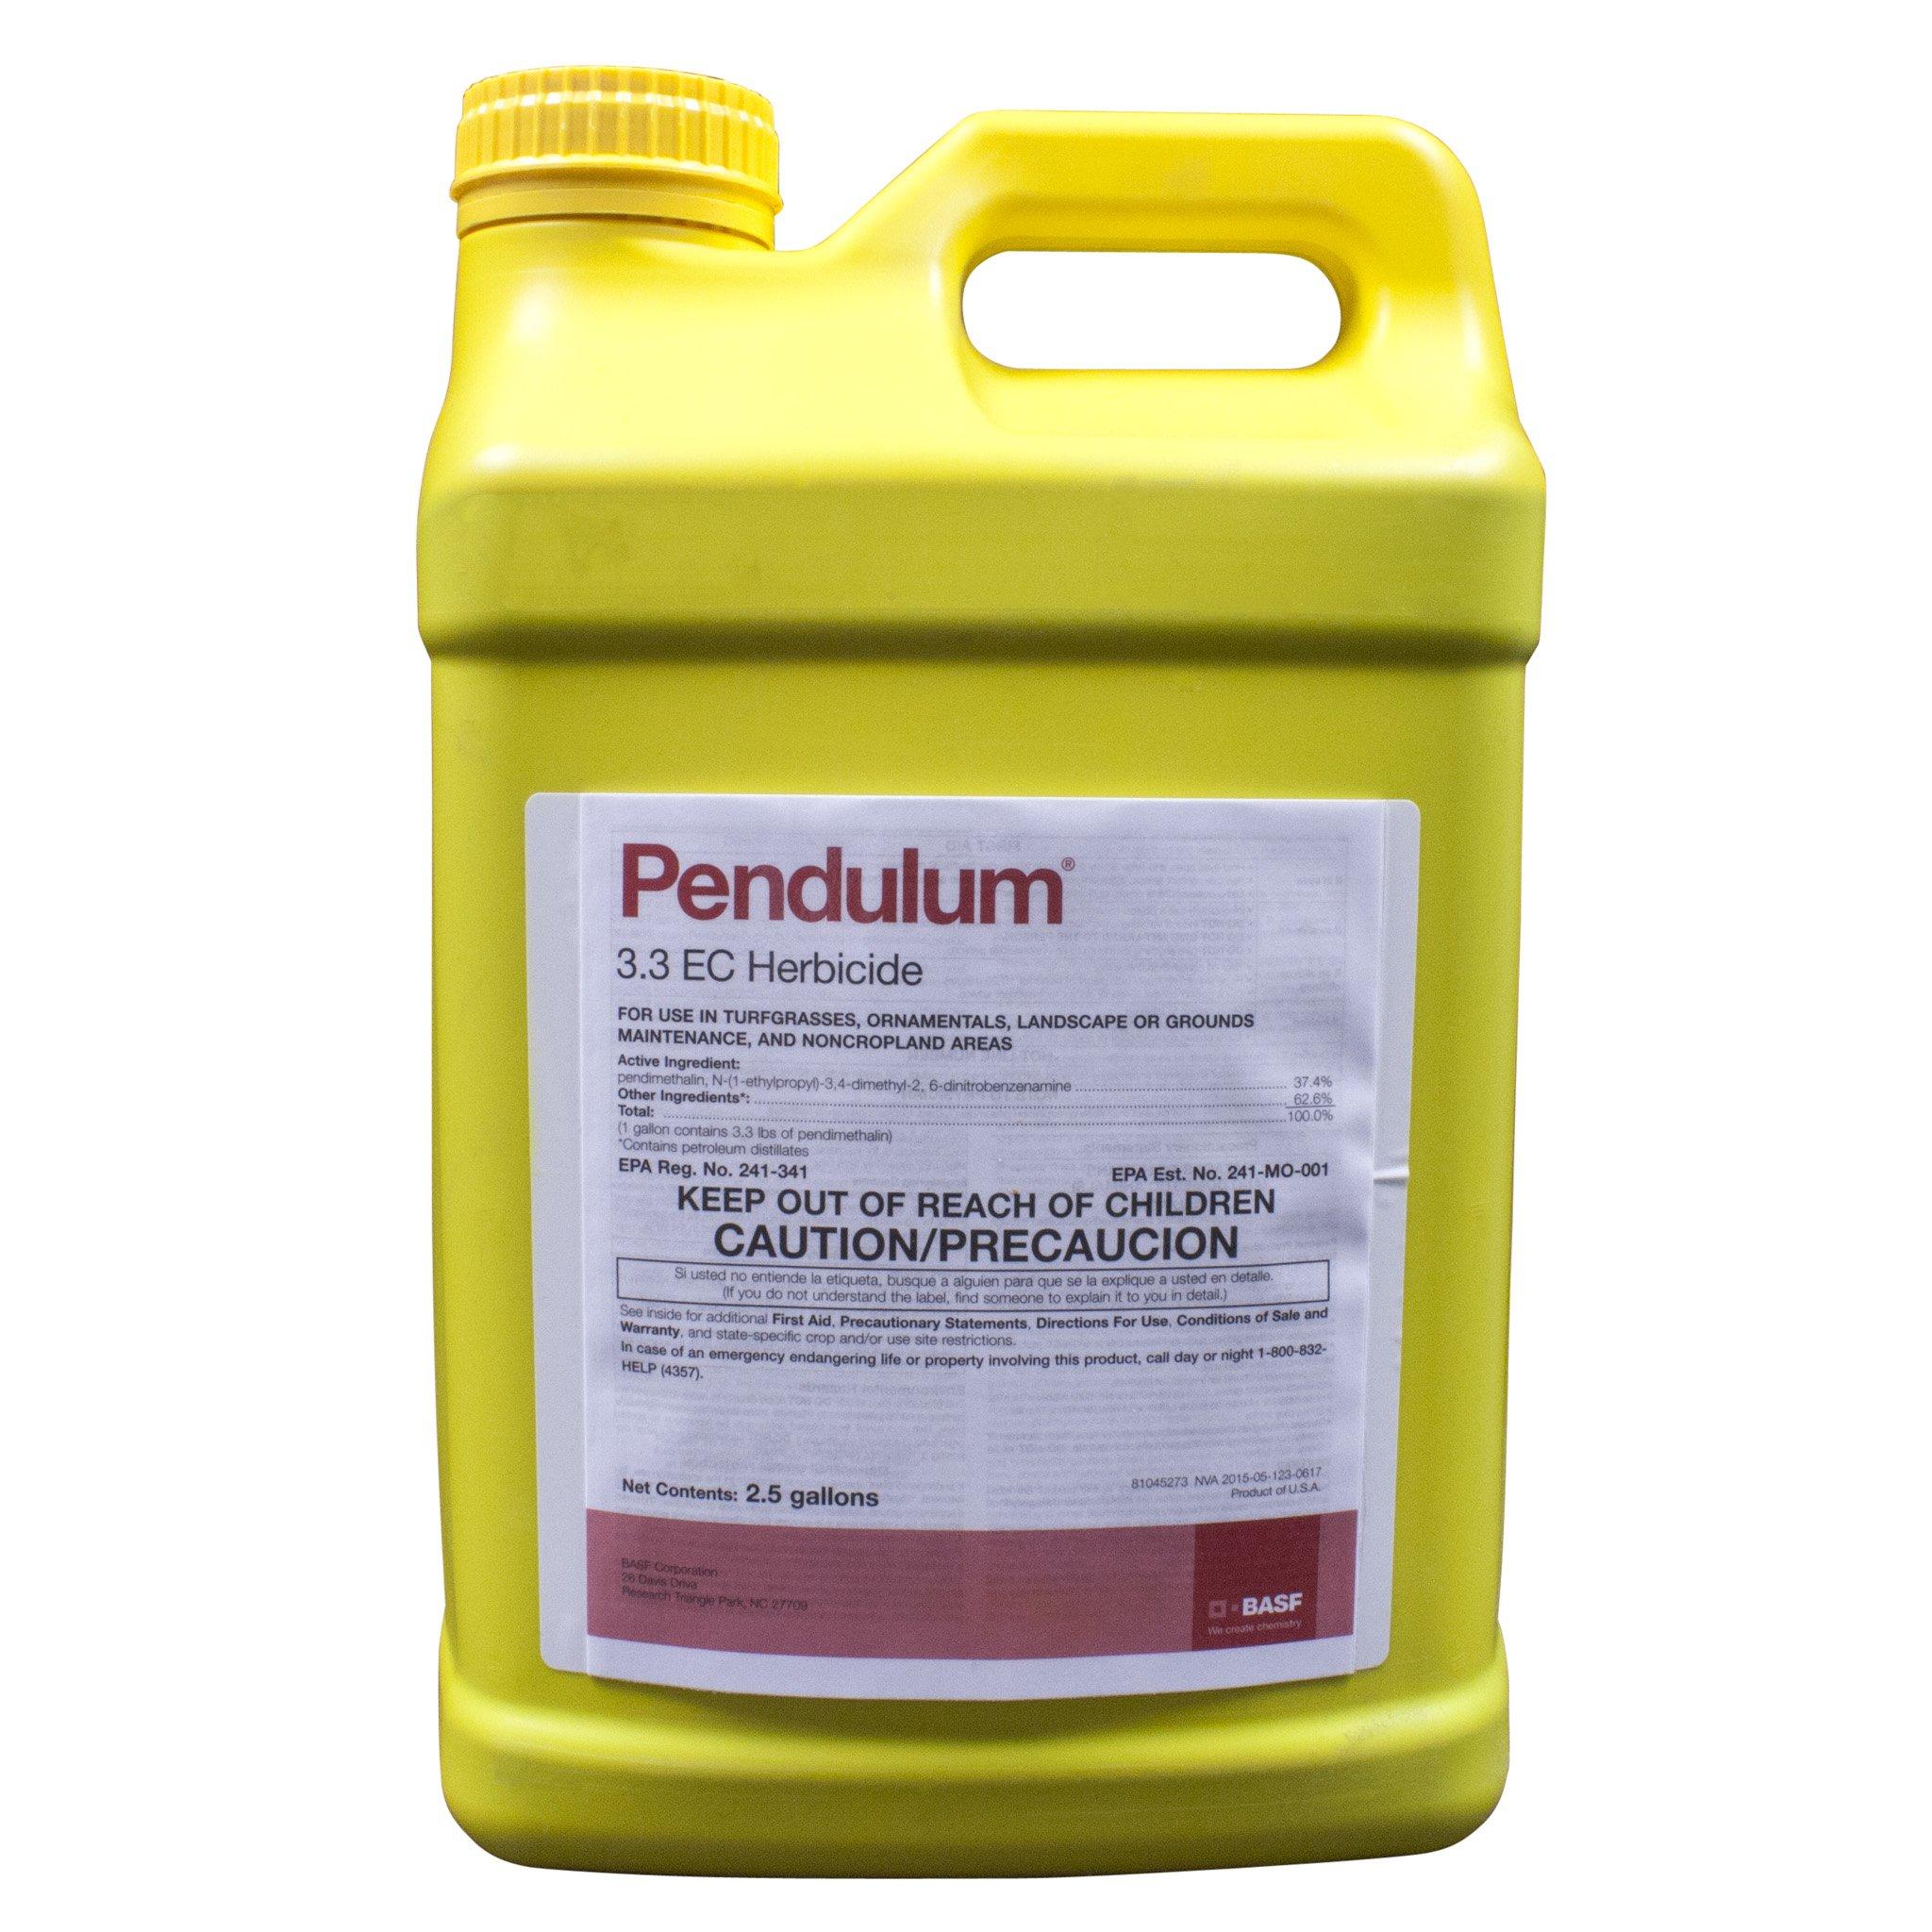 Pendulum 3.3 EC - 2.5 Gallons by BASF (Whitmire Micro-Gen)